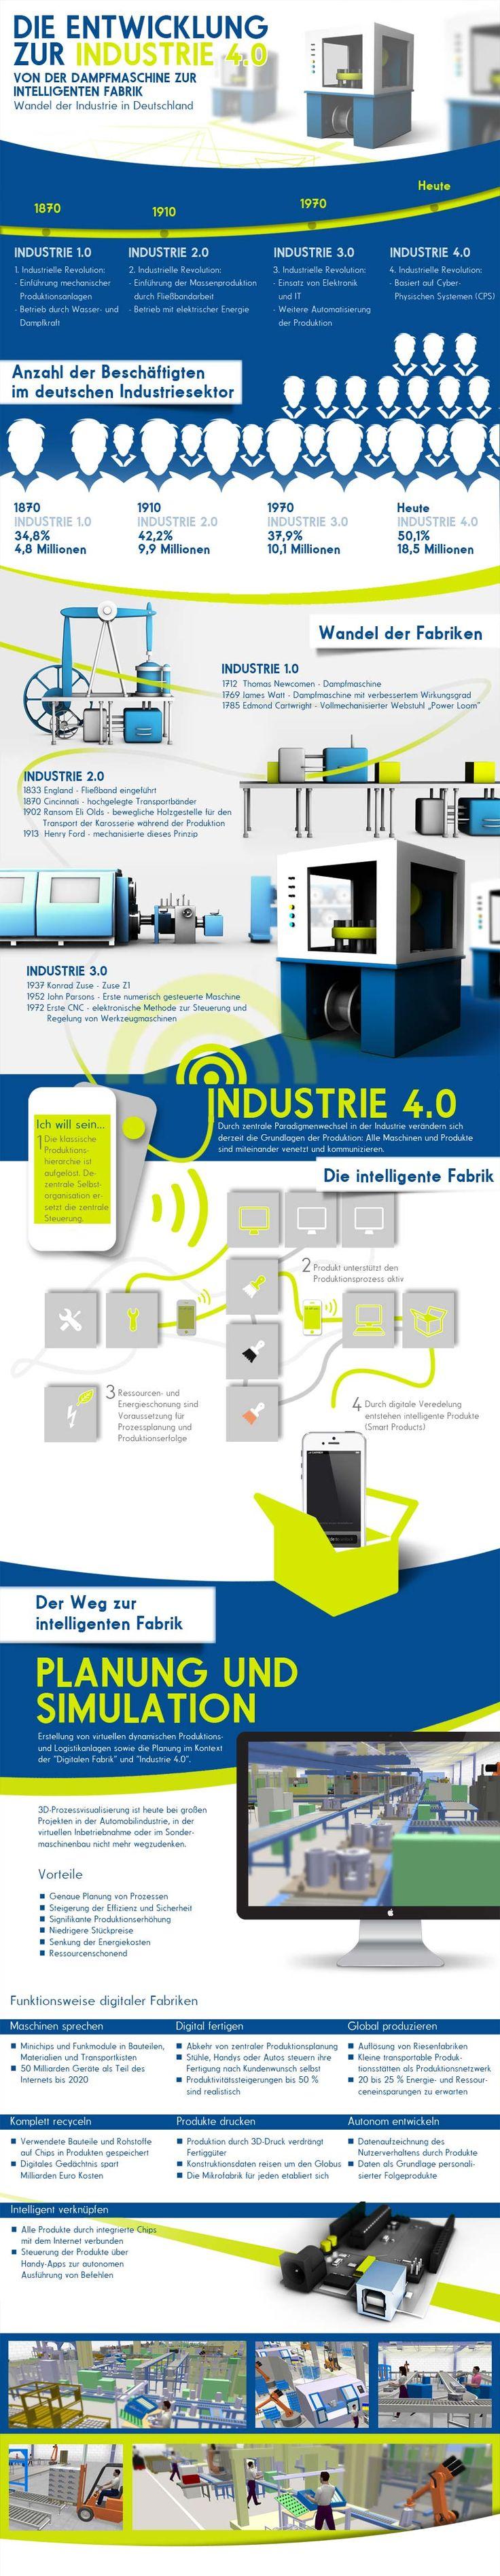 Virtuelle Fabrik 4.0      02. Dezember 2013  Bei intelligenten, industriellen Prozessen müssen reale und virtuelle Welt zukünftig noch besser verzahnt werden. http://www.pro-physik.de/details/news/5599301/Virtuelle_Fabrik_4_0.html Industrie 4.0 Infografik: http://www.tarakos.de/infografik-die-entwicklung-zur-industrie-4-0.html